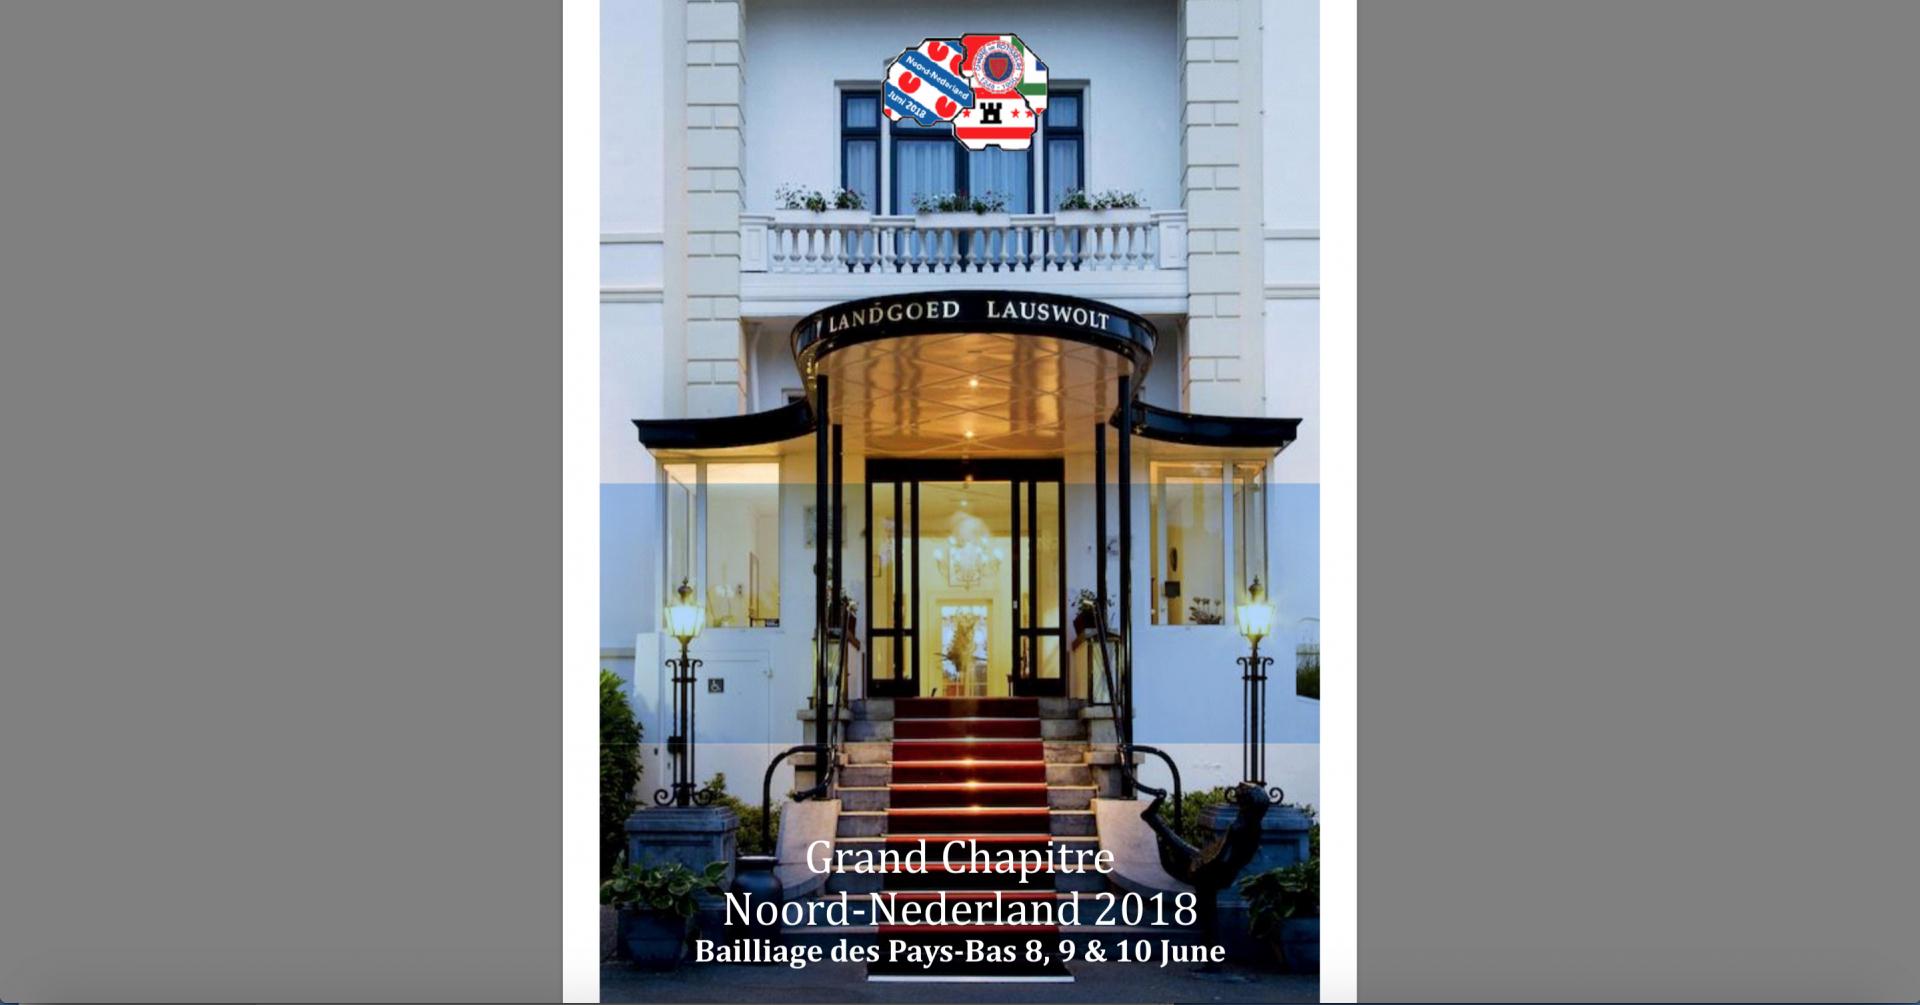 Grand Chapitre Noord-Nederland 2018